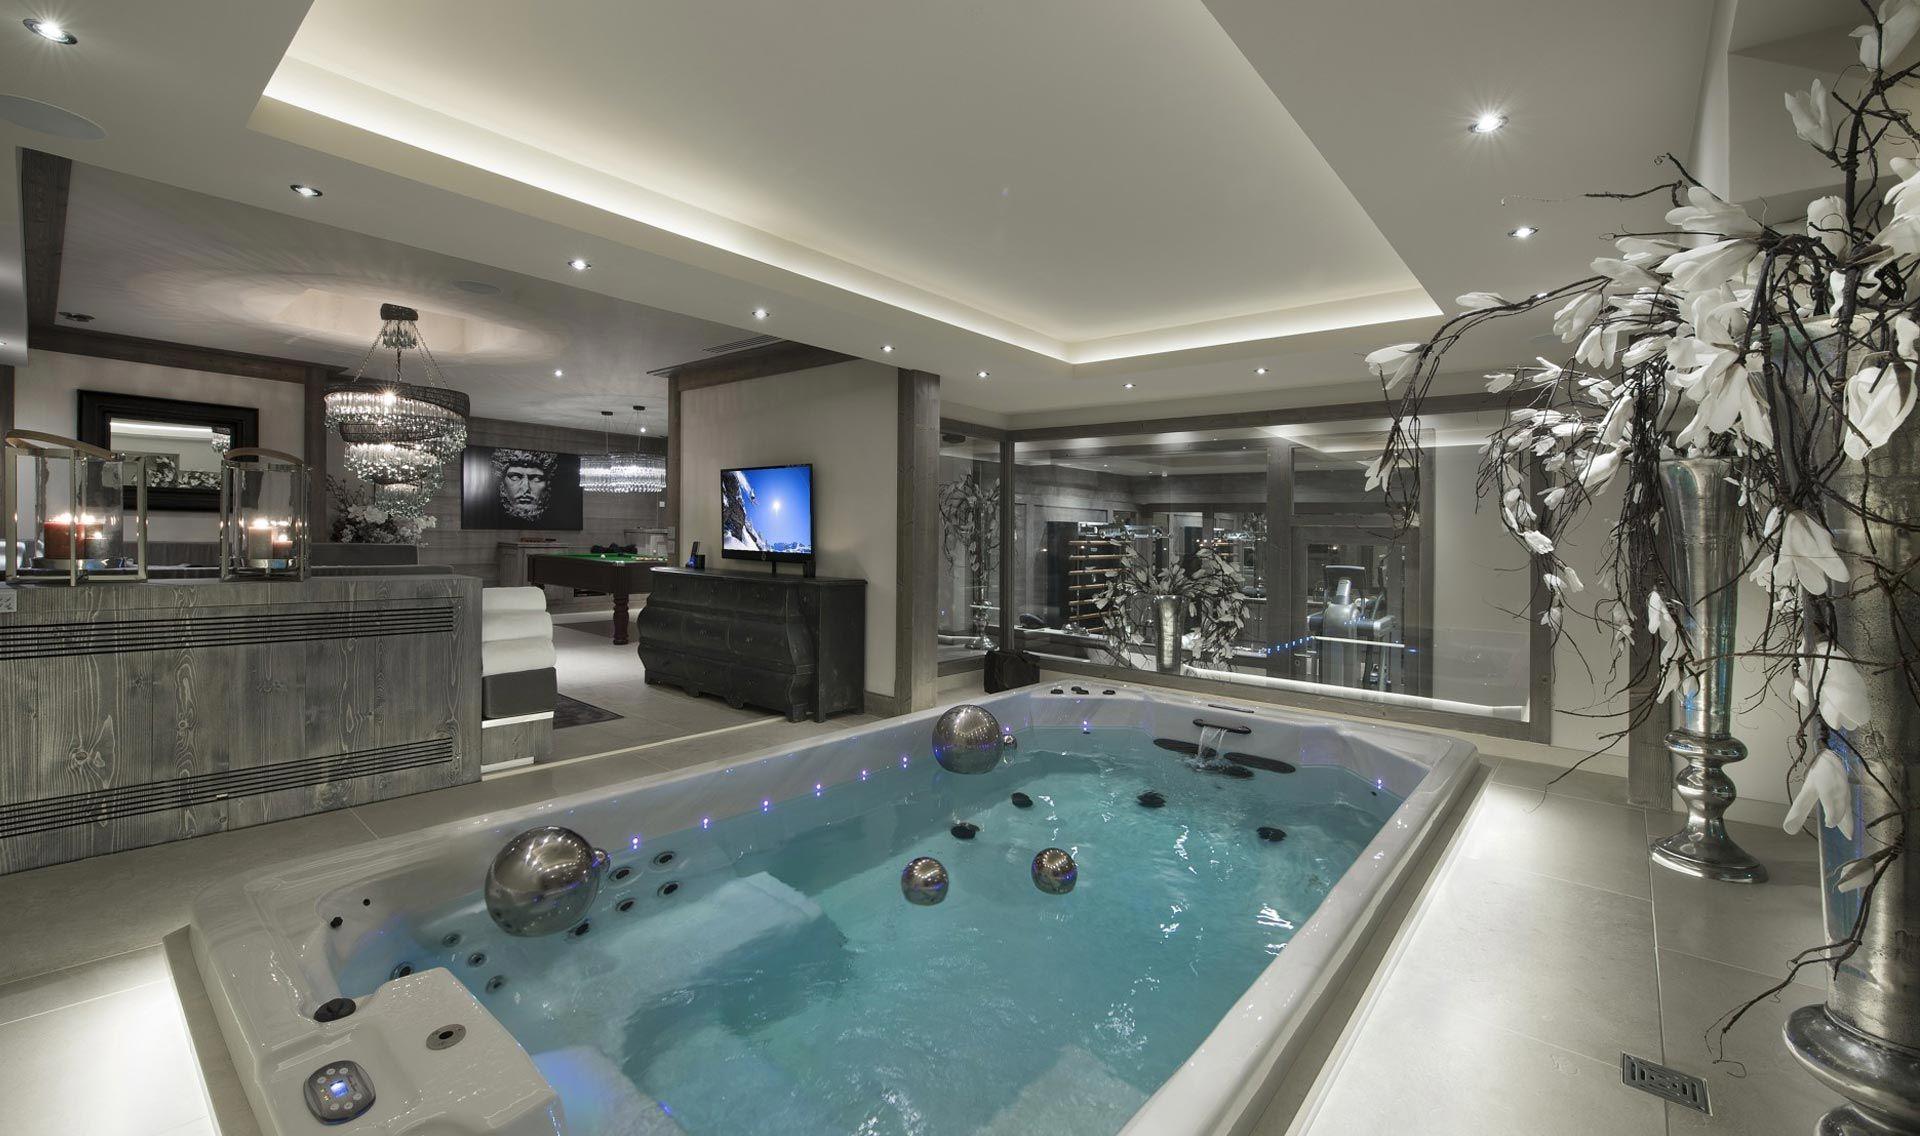 Afficher L Image D Origine House Villa Pool Indoor